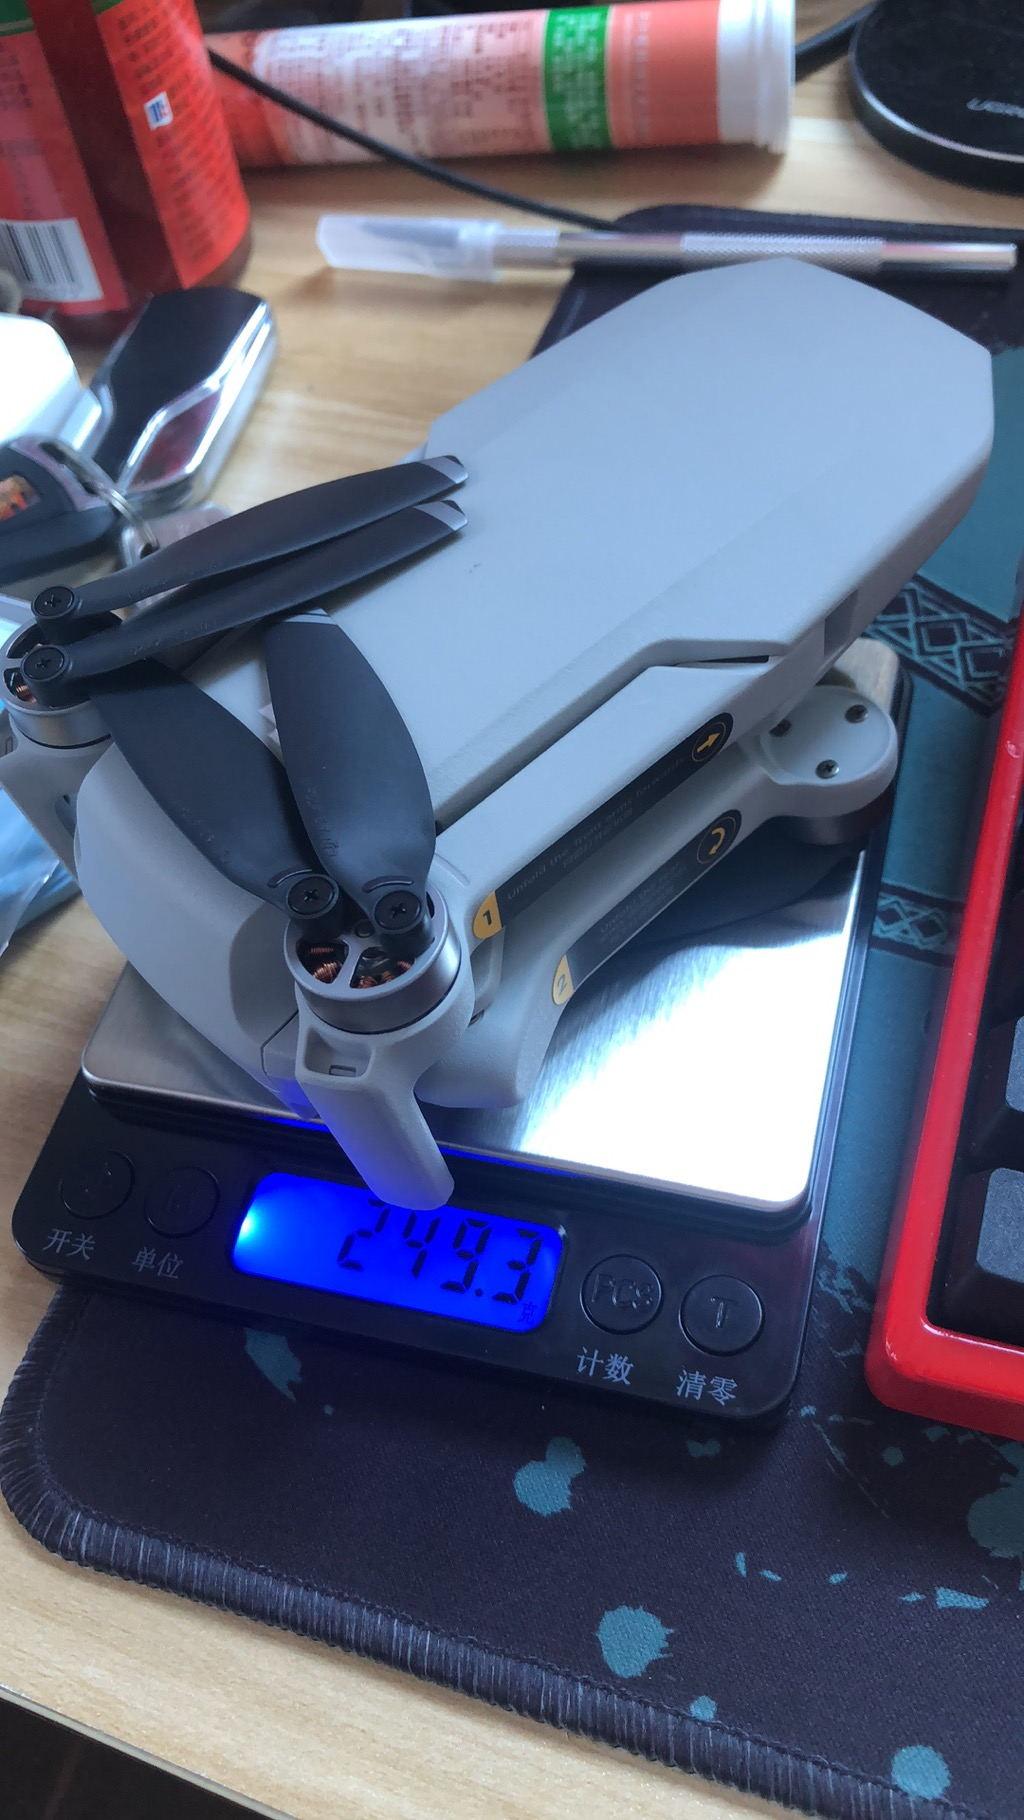 DJI 大疆 御 Mavic Mini 开箱使用 个人 第8张